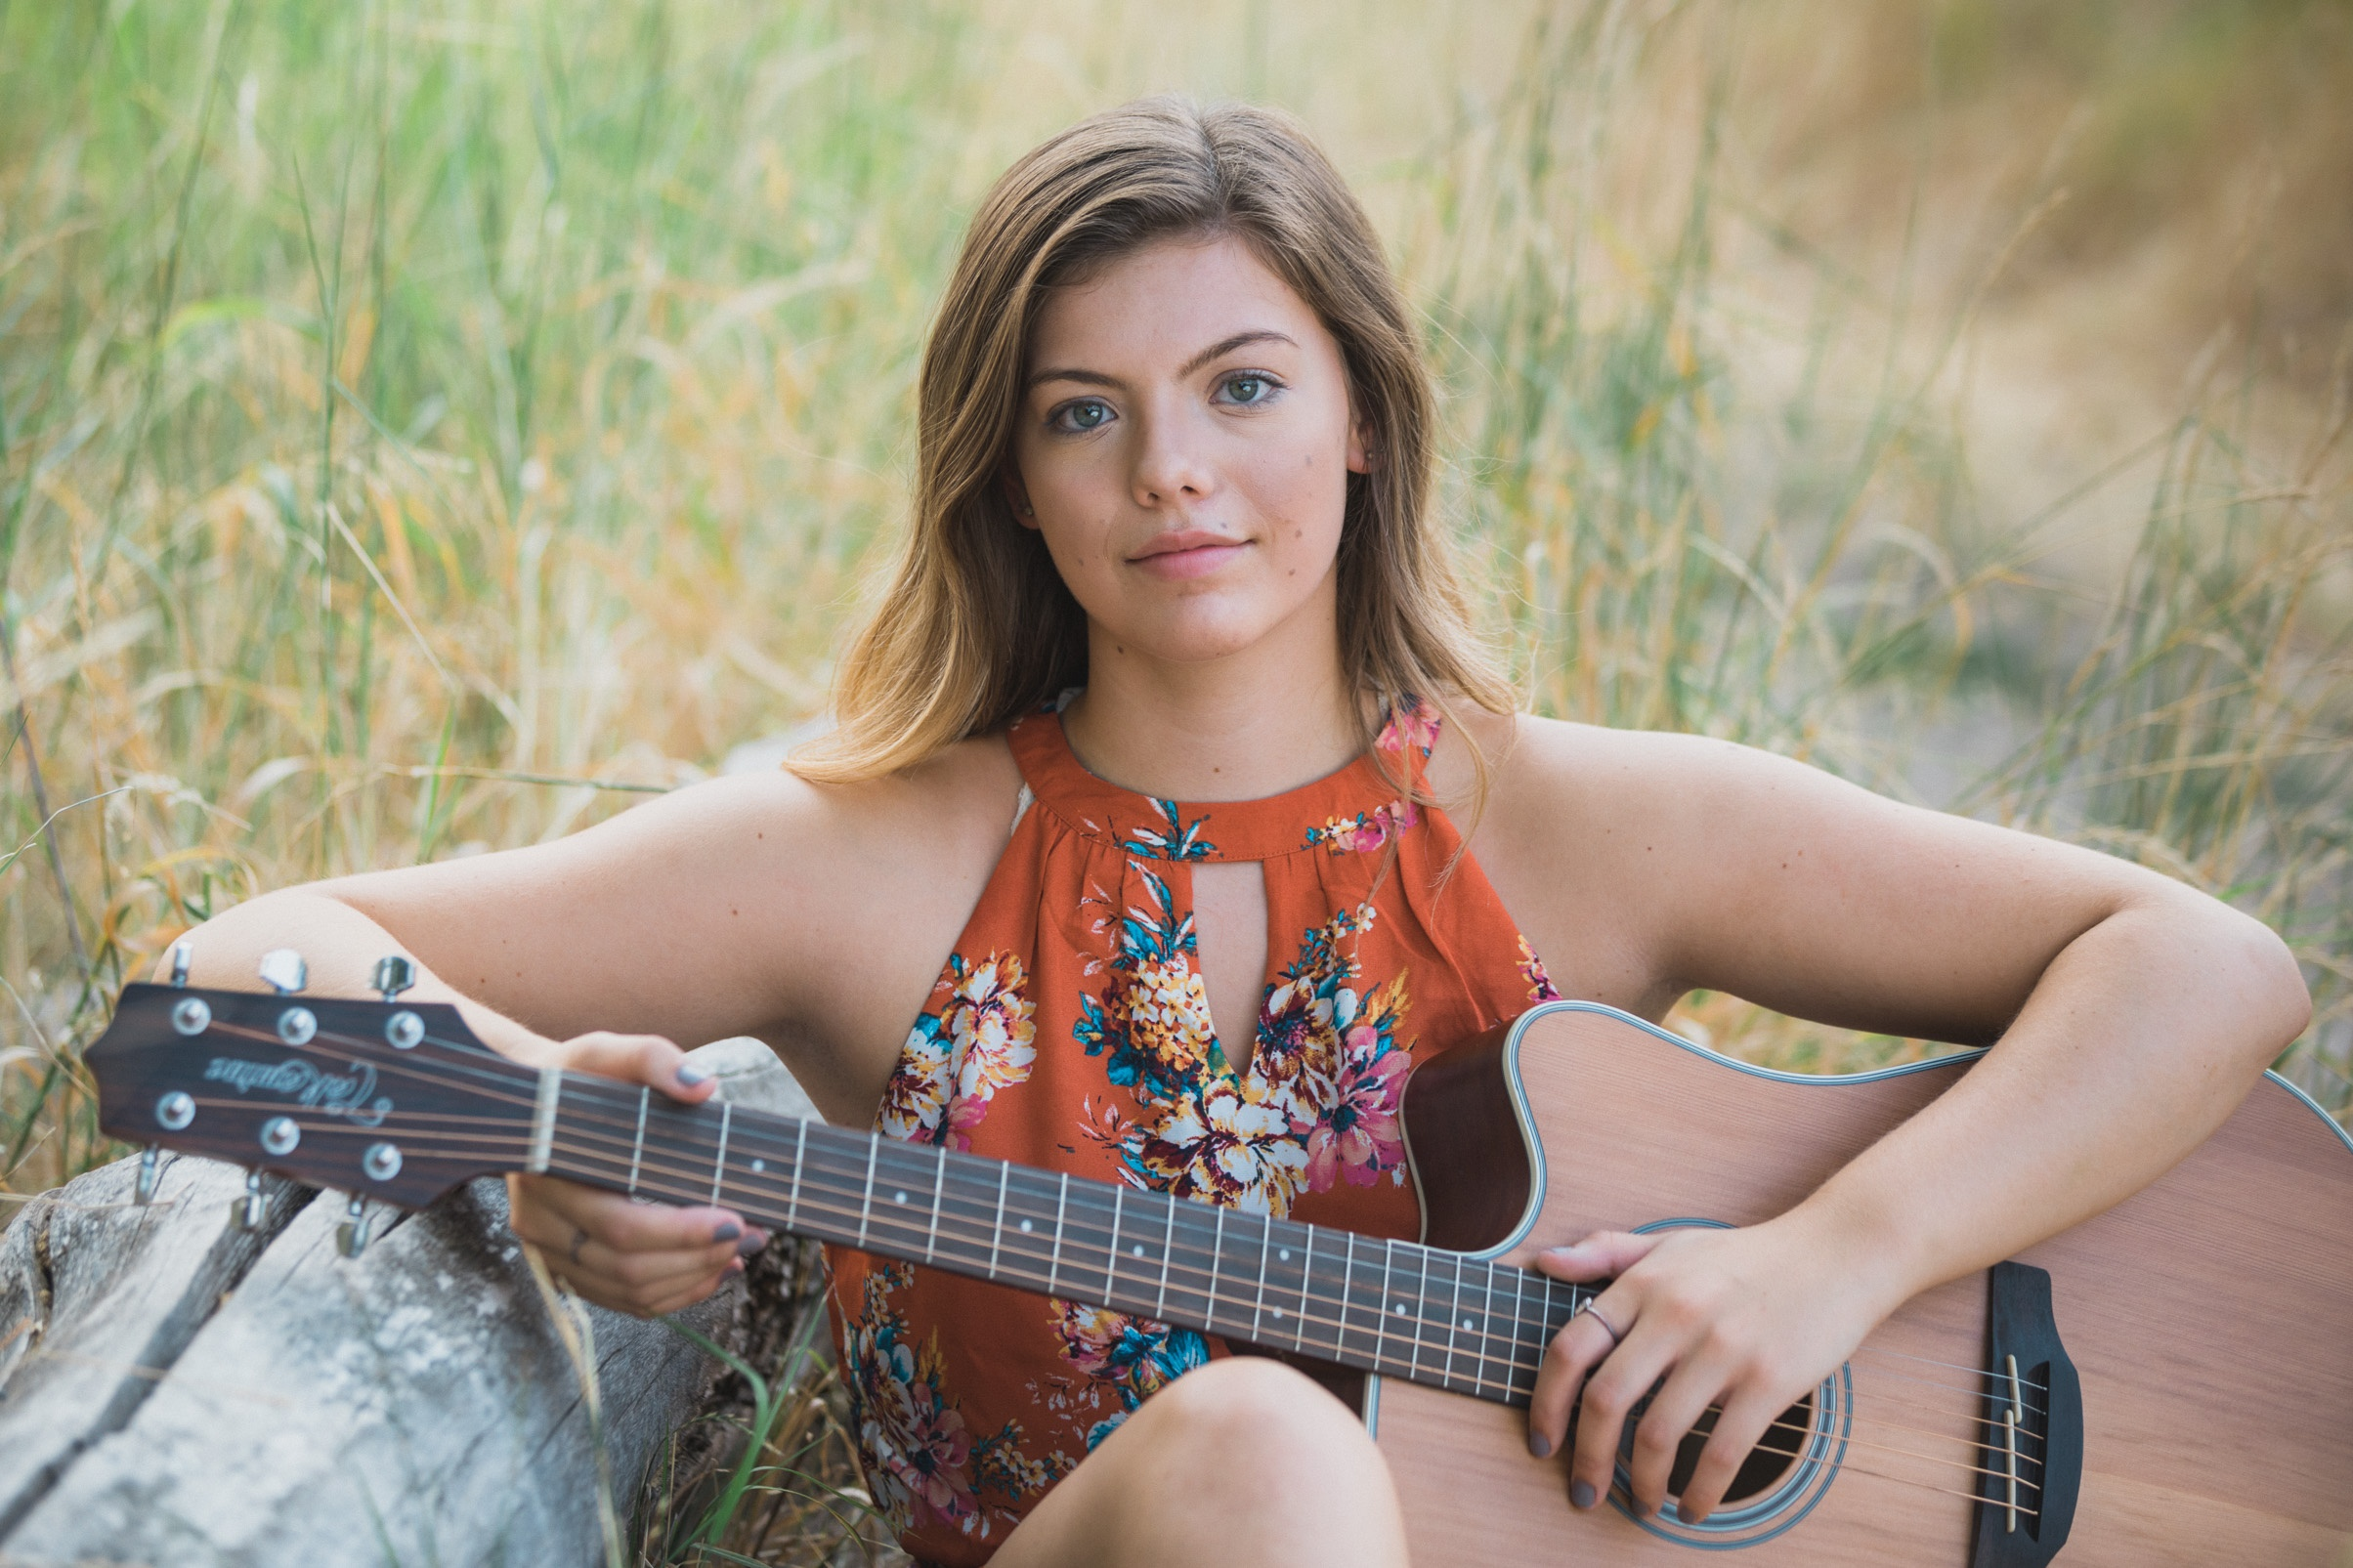 high school girl with guitar senior photo